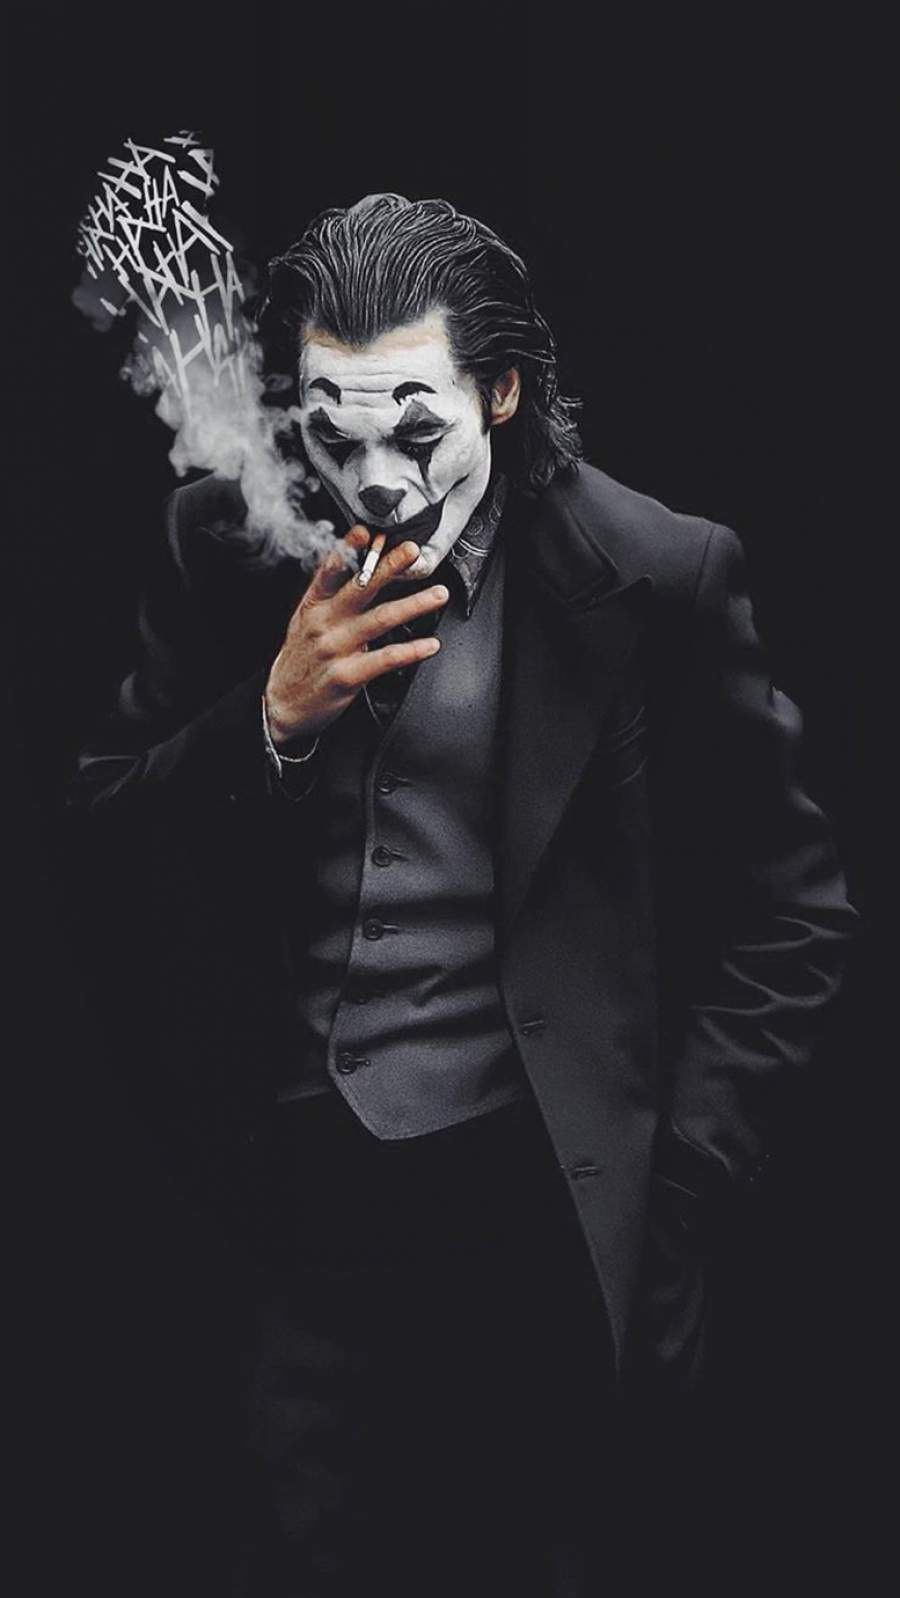 Joker Smoke Laugh Iphone Wallpaper In 2020 Joker Iphone Wallpaper Joker Wallpapers Batman Joker Wallpaper